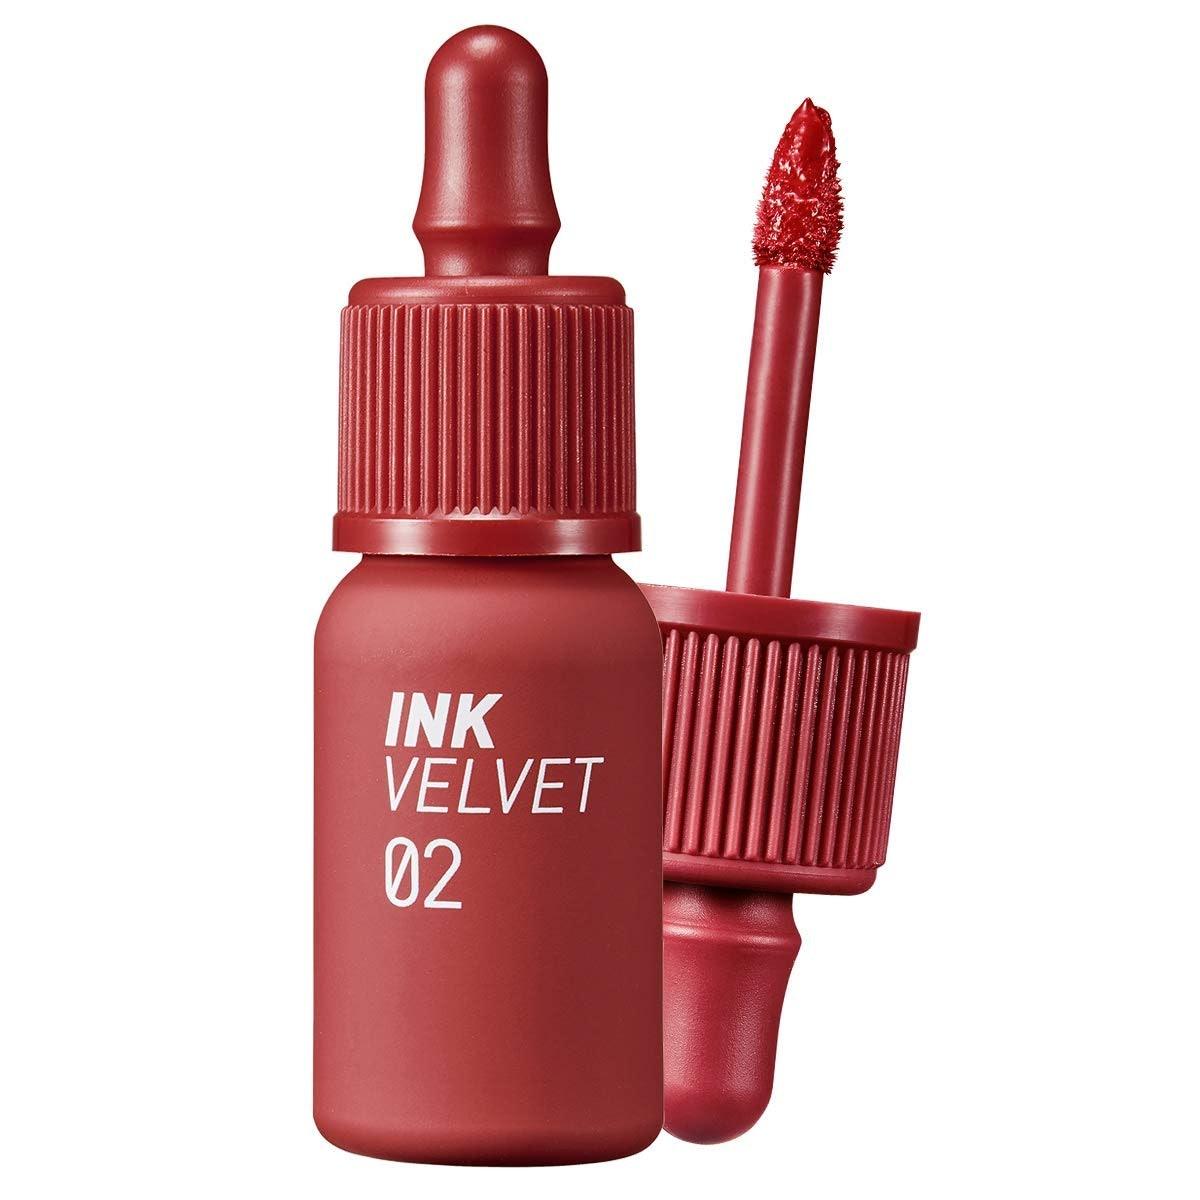 Peripera Ink Velvet Lip Tint